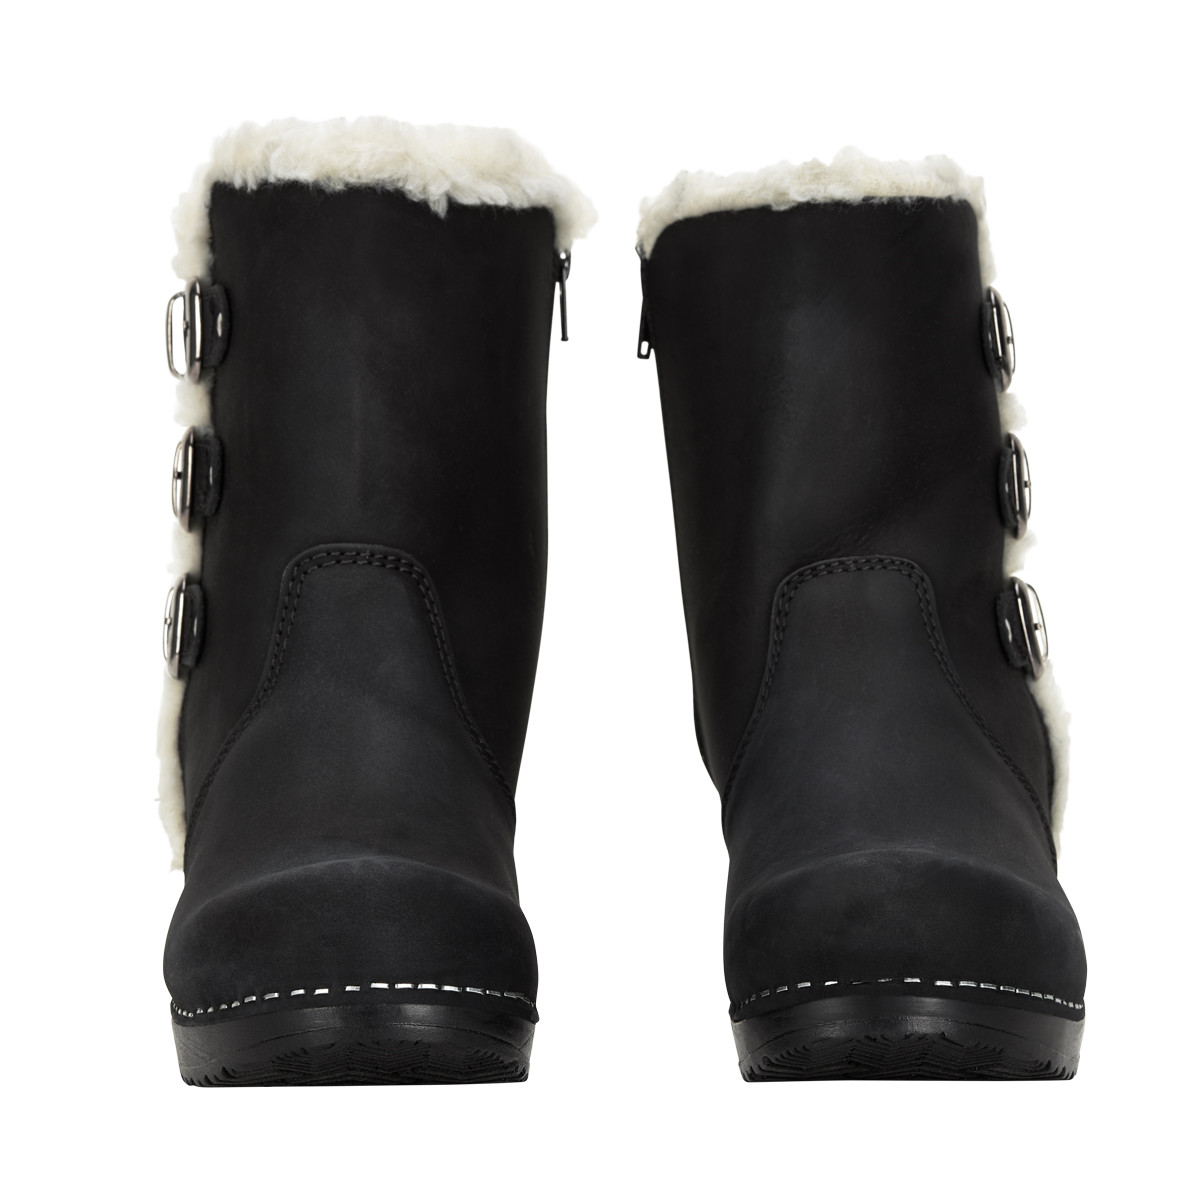 Sanita Original Everest Stiefel 456228 2 ( Preis € 82.43 ) Sanita®